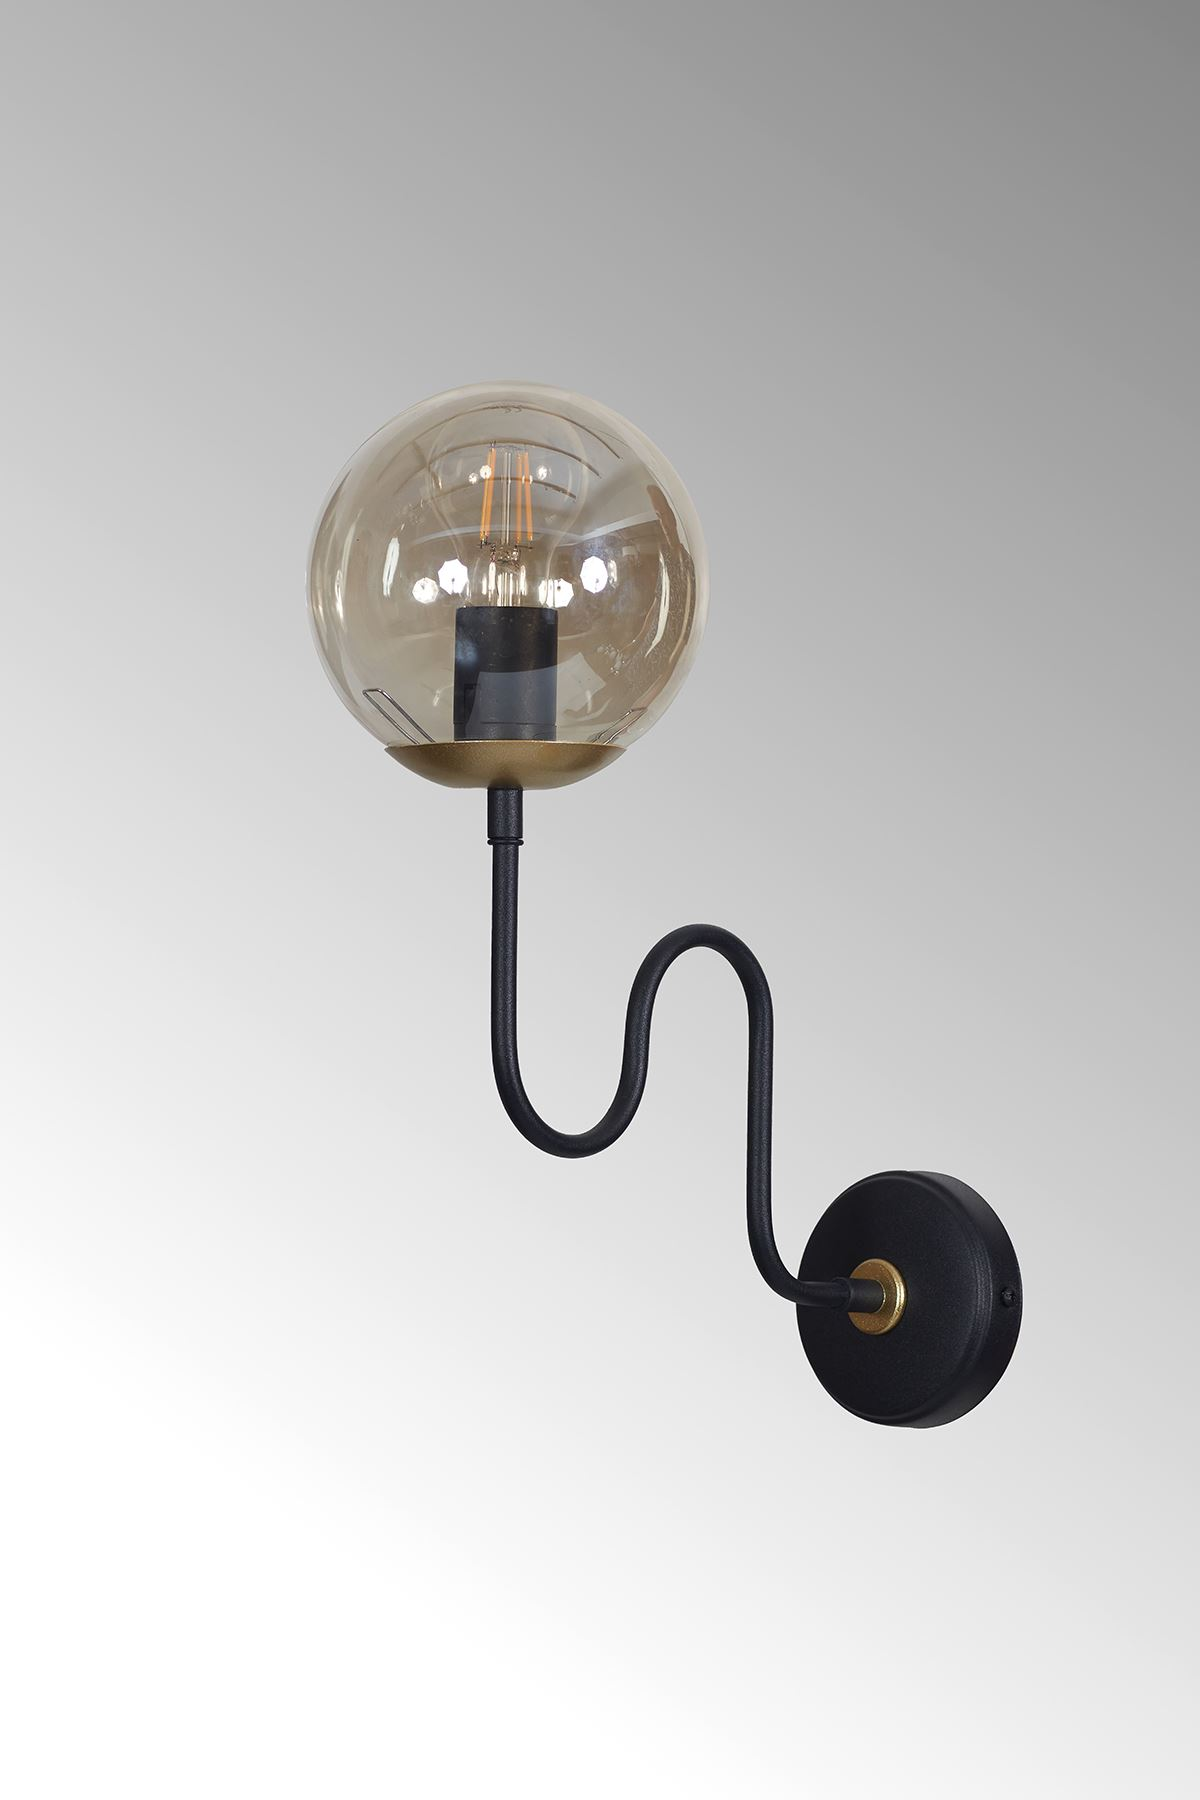 Ferro Dikey Sarı-Siyah Metal Gövde Bal Rengi Camlı Tasarım Lüx Aplik